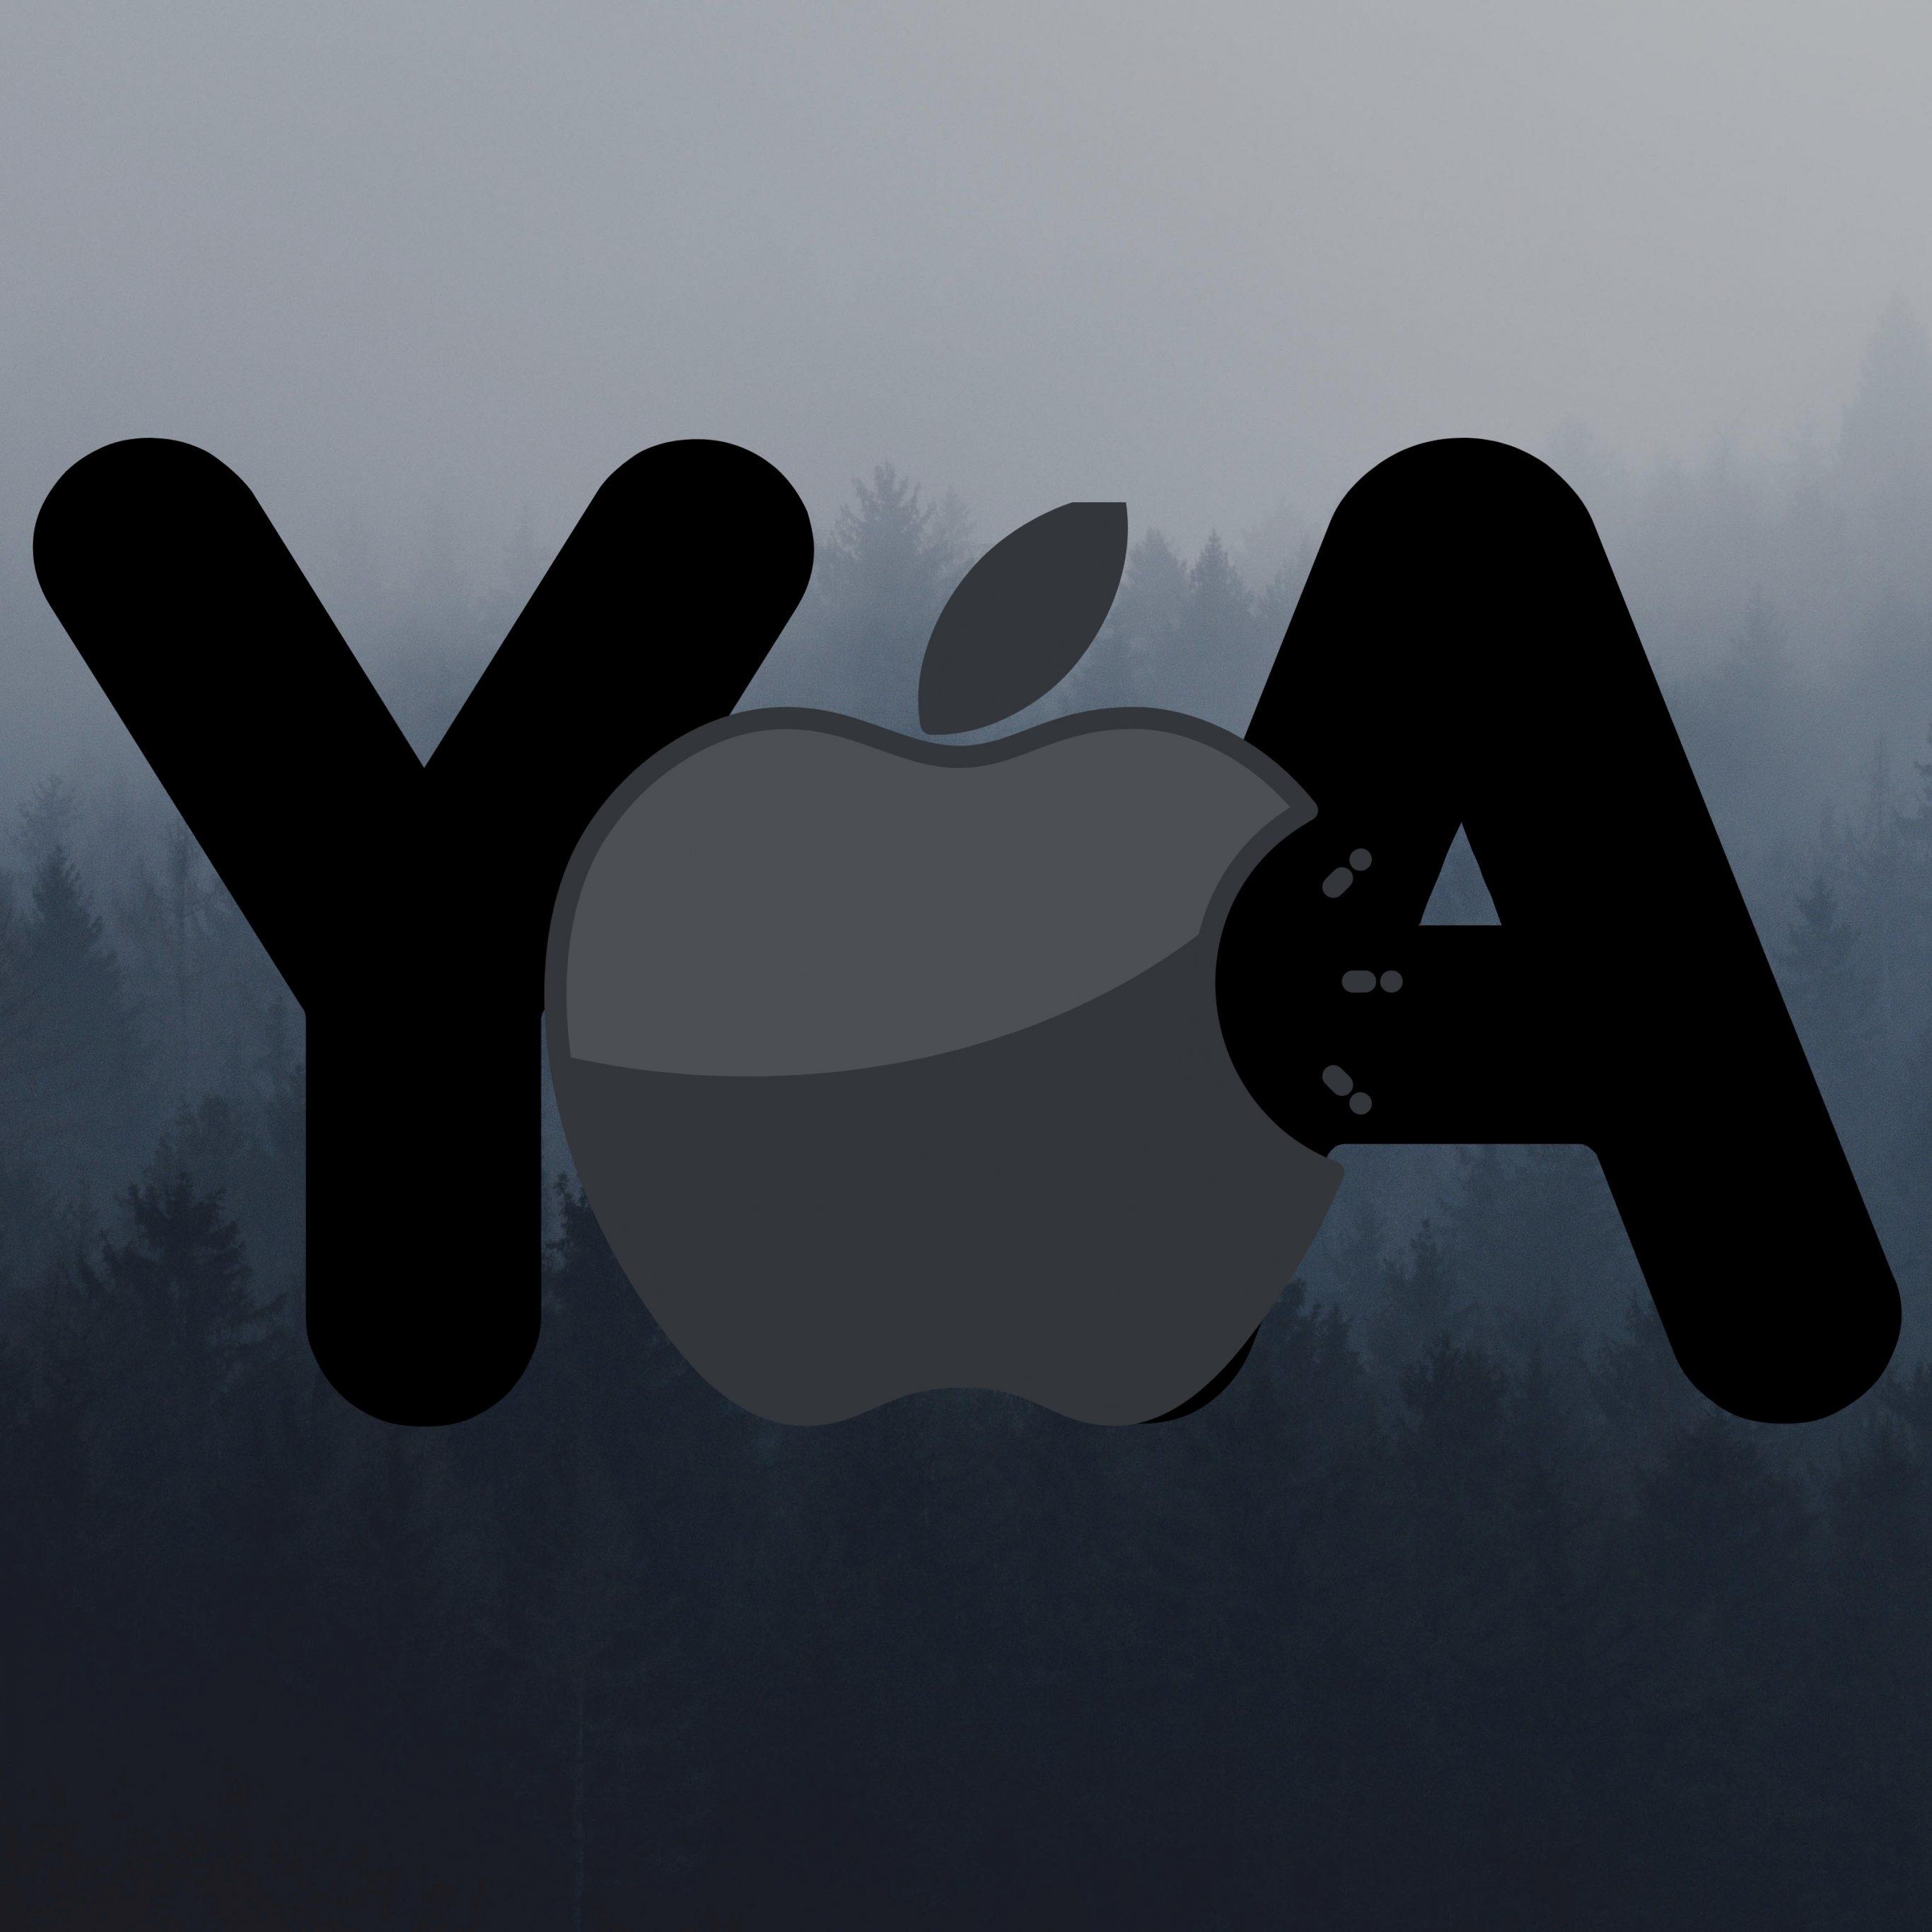 2732x2732 wallpapers 4k iPad Pro Apple Logo Ya Grey Background iPad Wallpaper 2732x2732 pixels resolution